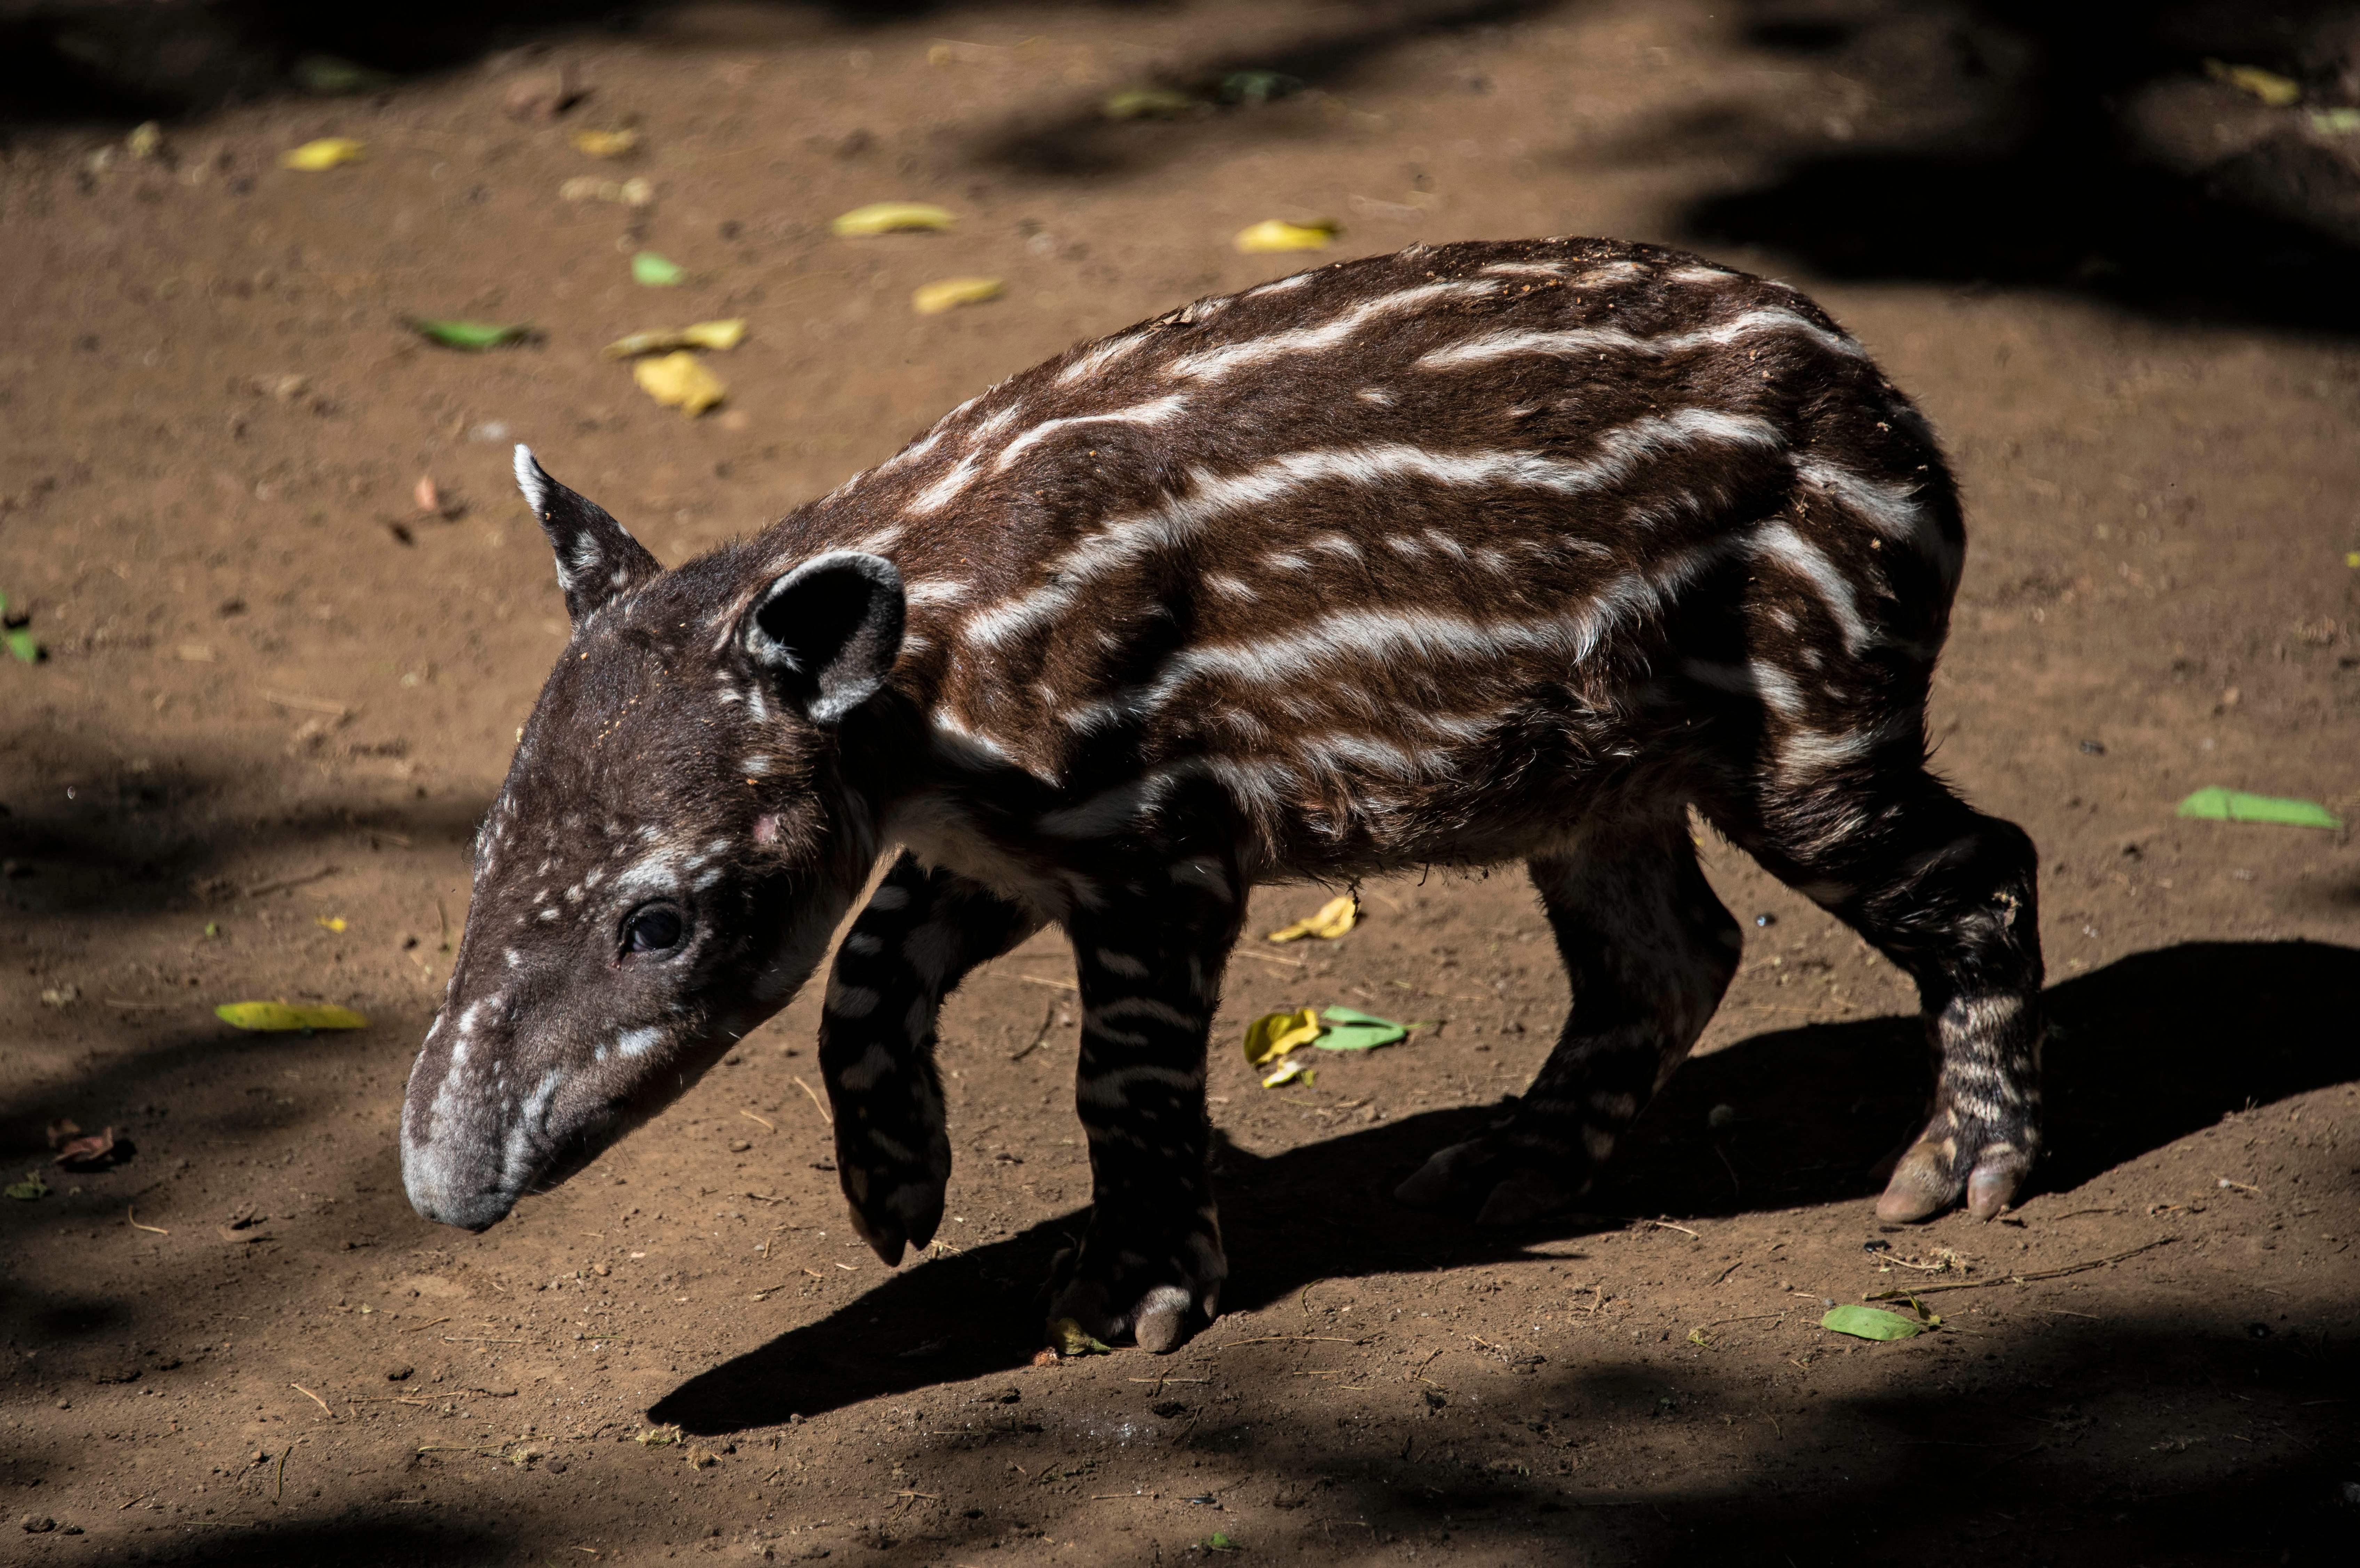 nicaragua-animales-peligro-extinción-dos.jpg